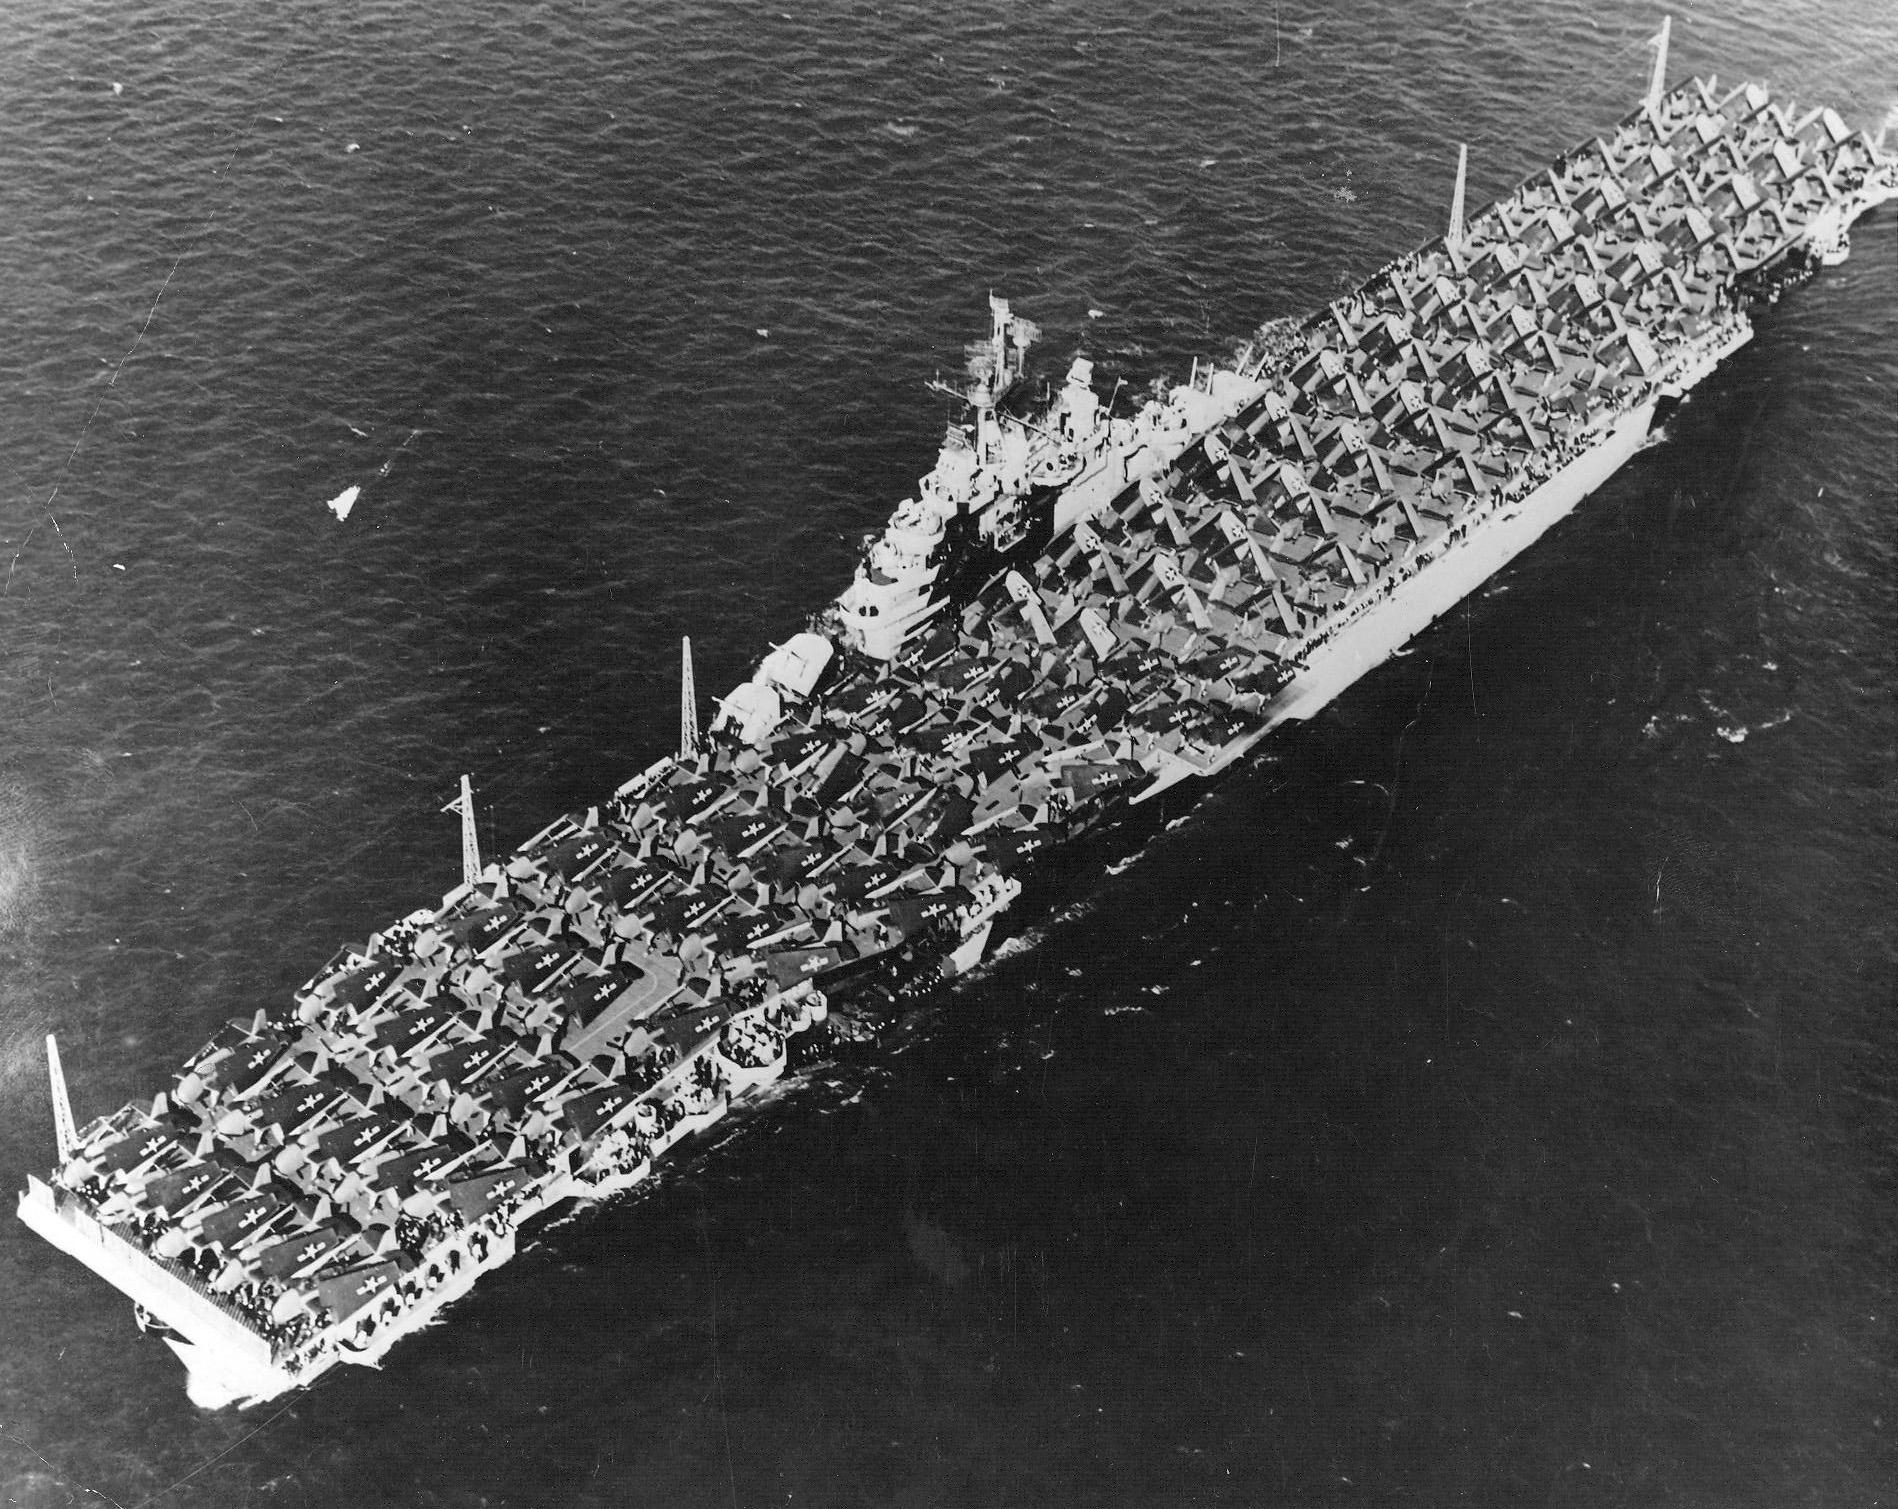 CV 9 USS Essex after her San Francisco refit April 15 1944 04